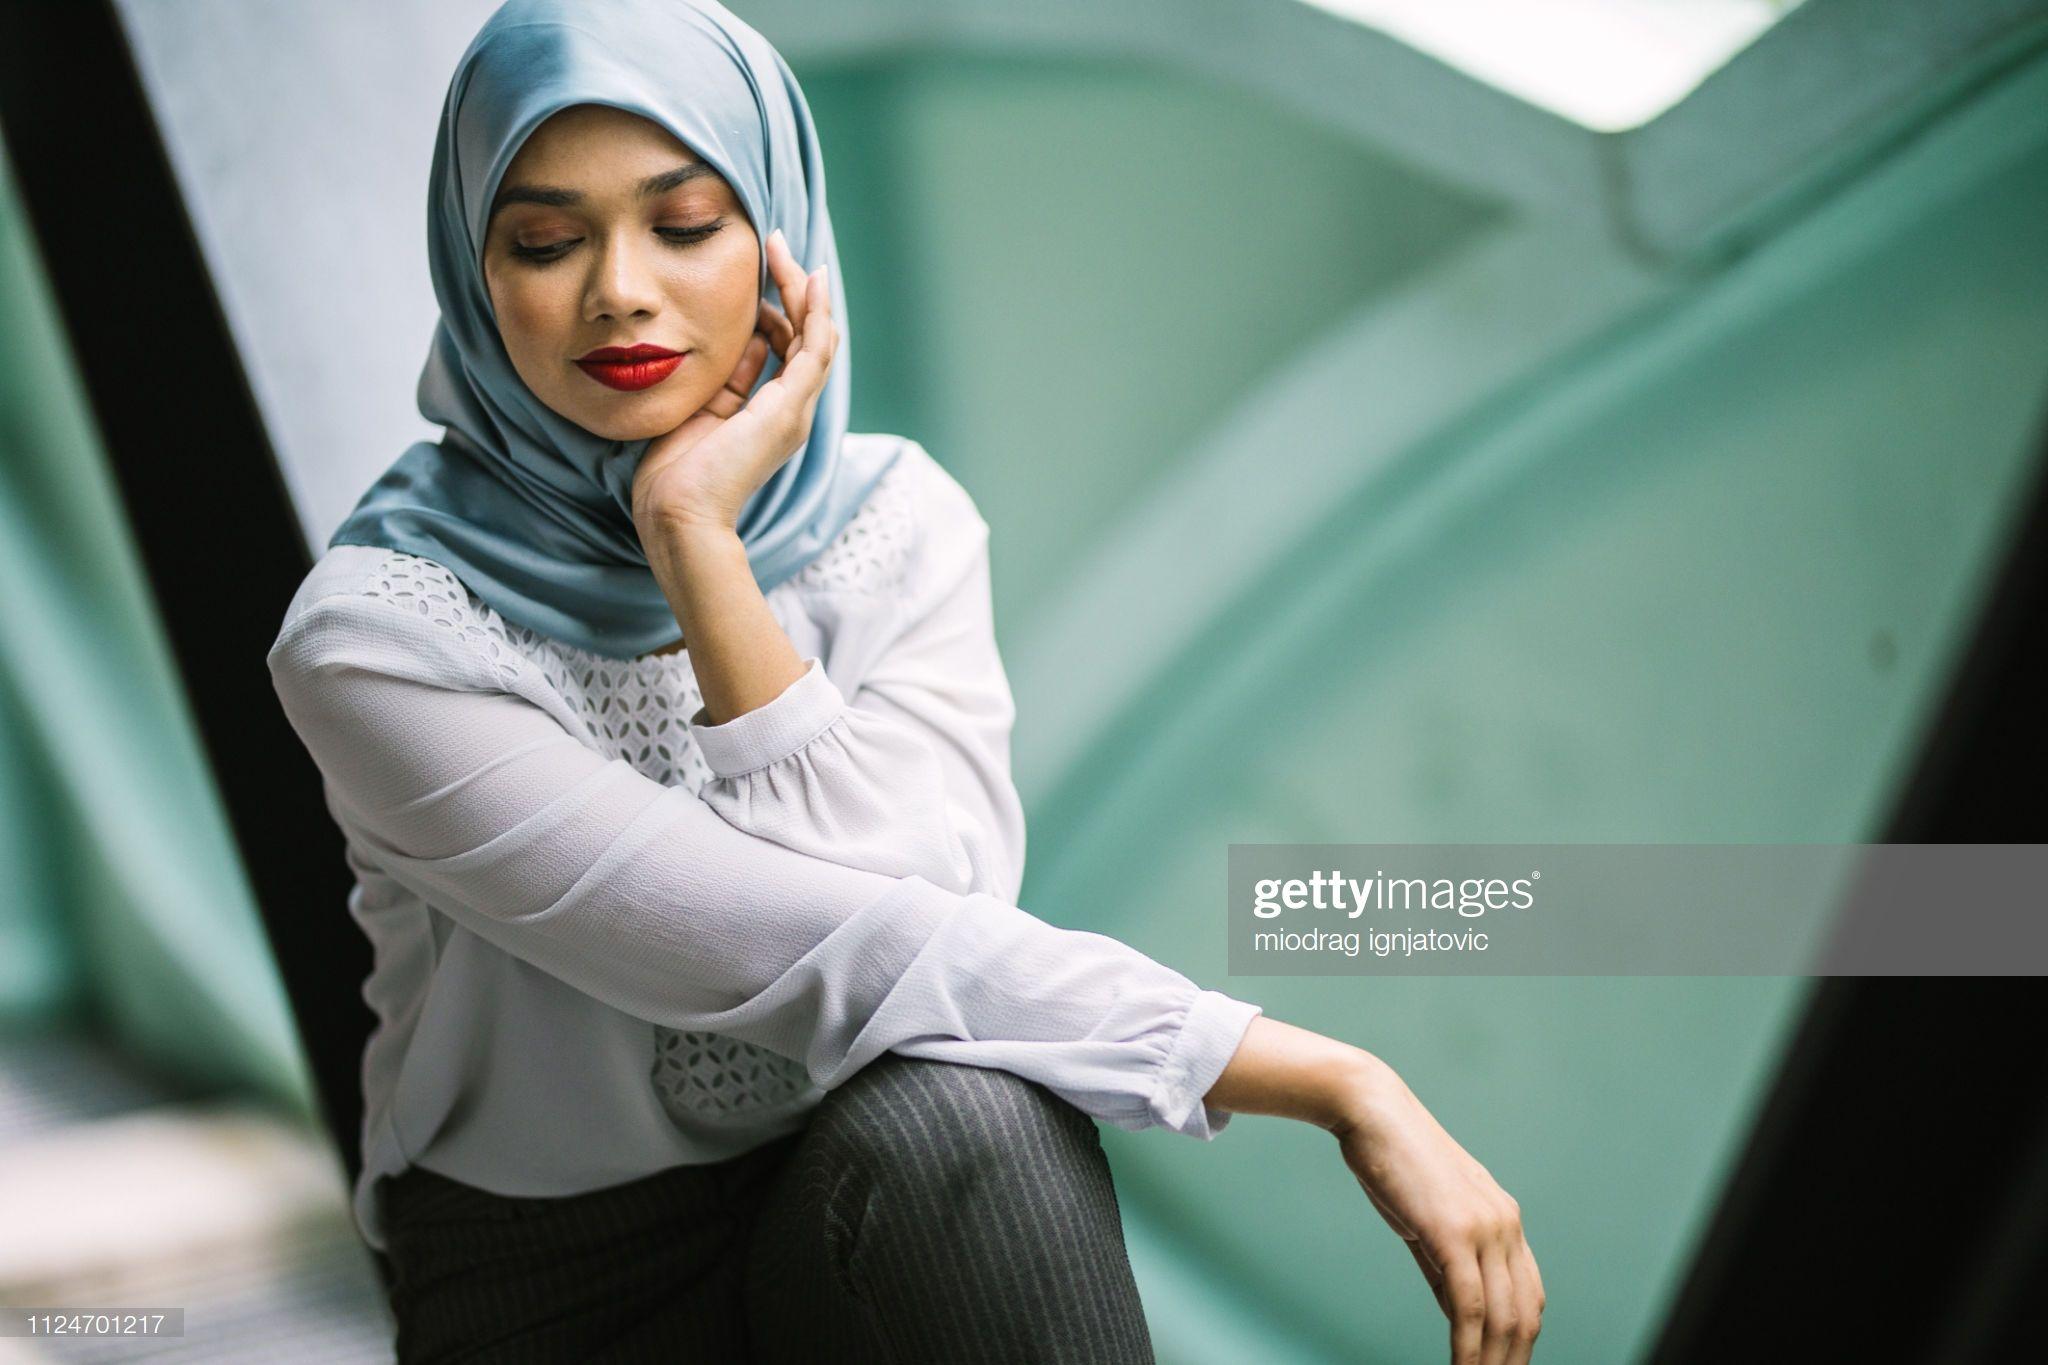 Dating Woman Hijab. Site- ul de dating gratuit ca nuca de cocos